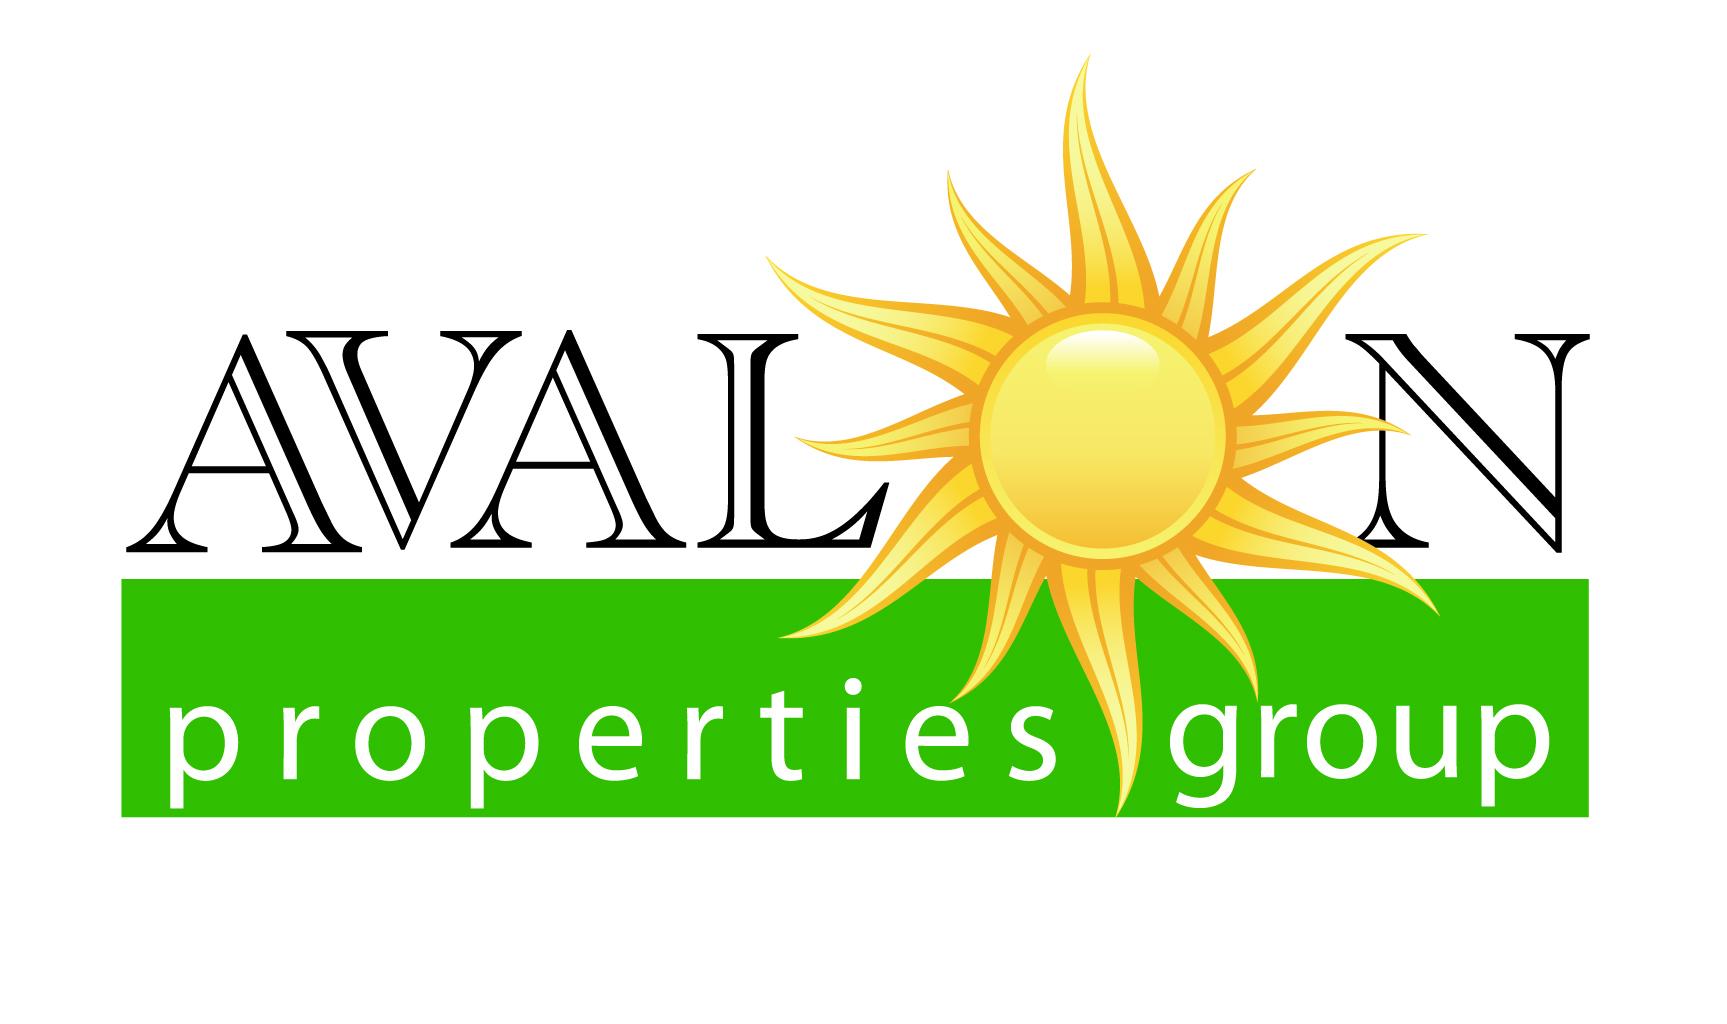 Avalon Properties Group logo